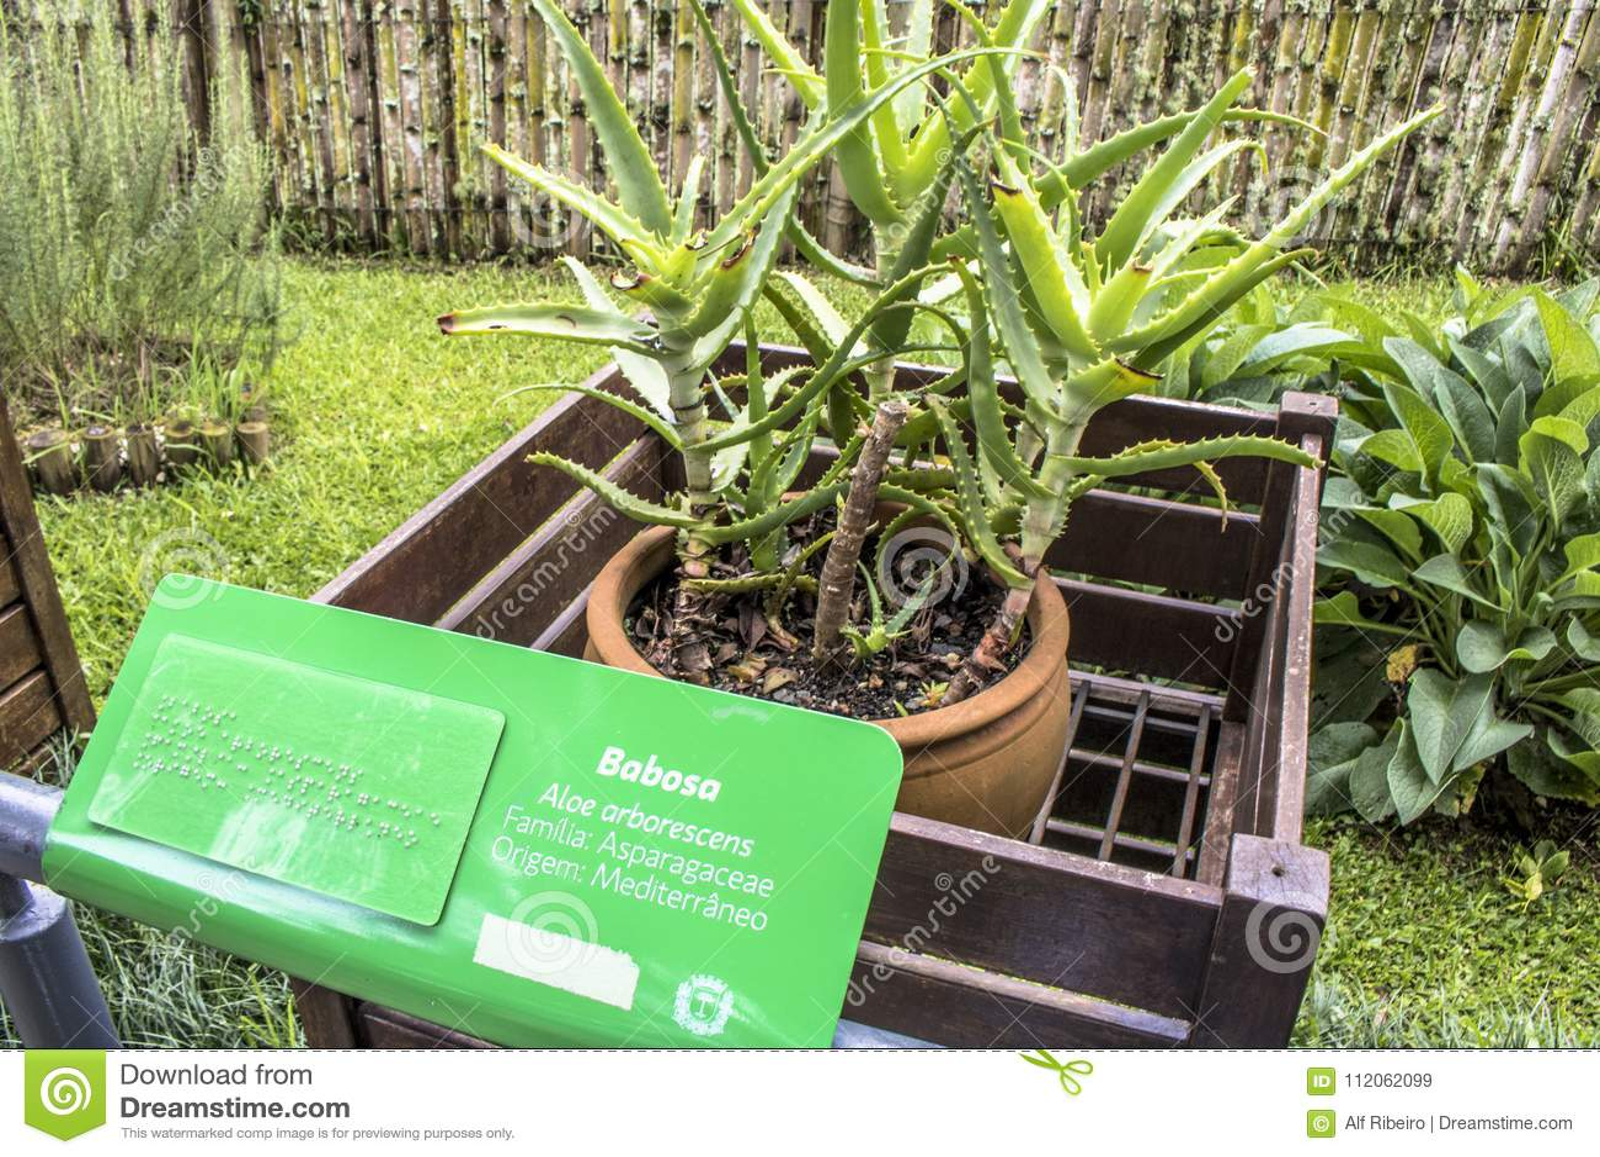 botanical garden editorial stock image. image of feelings - 112062099